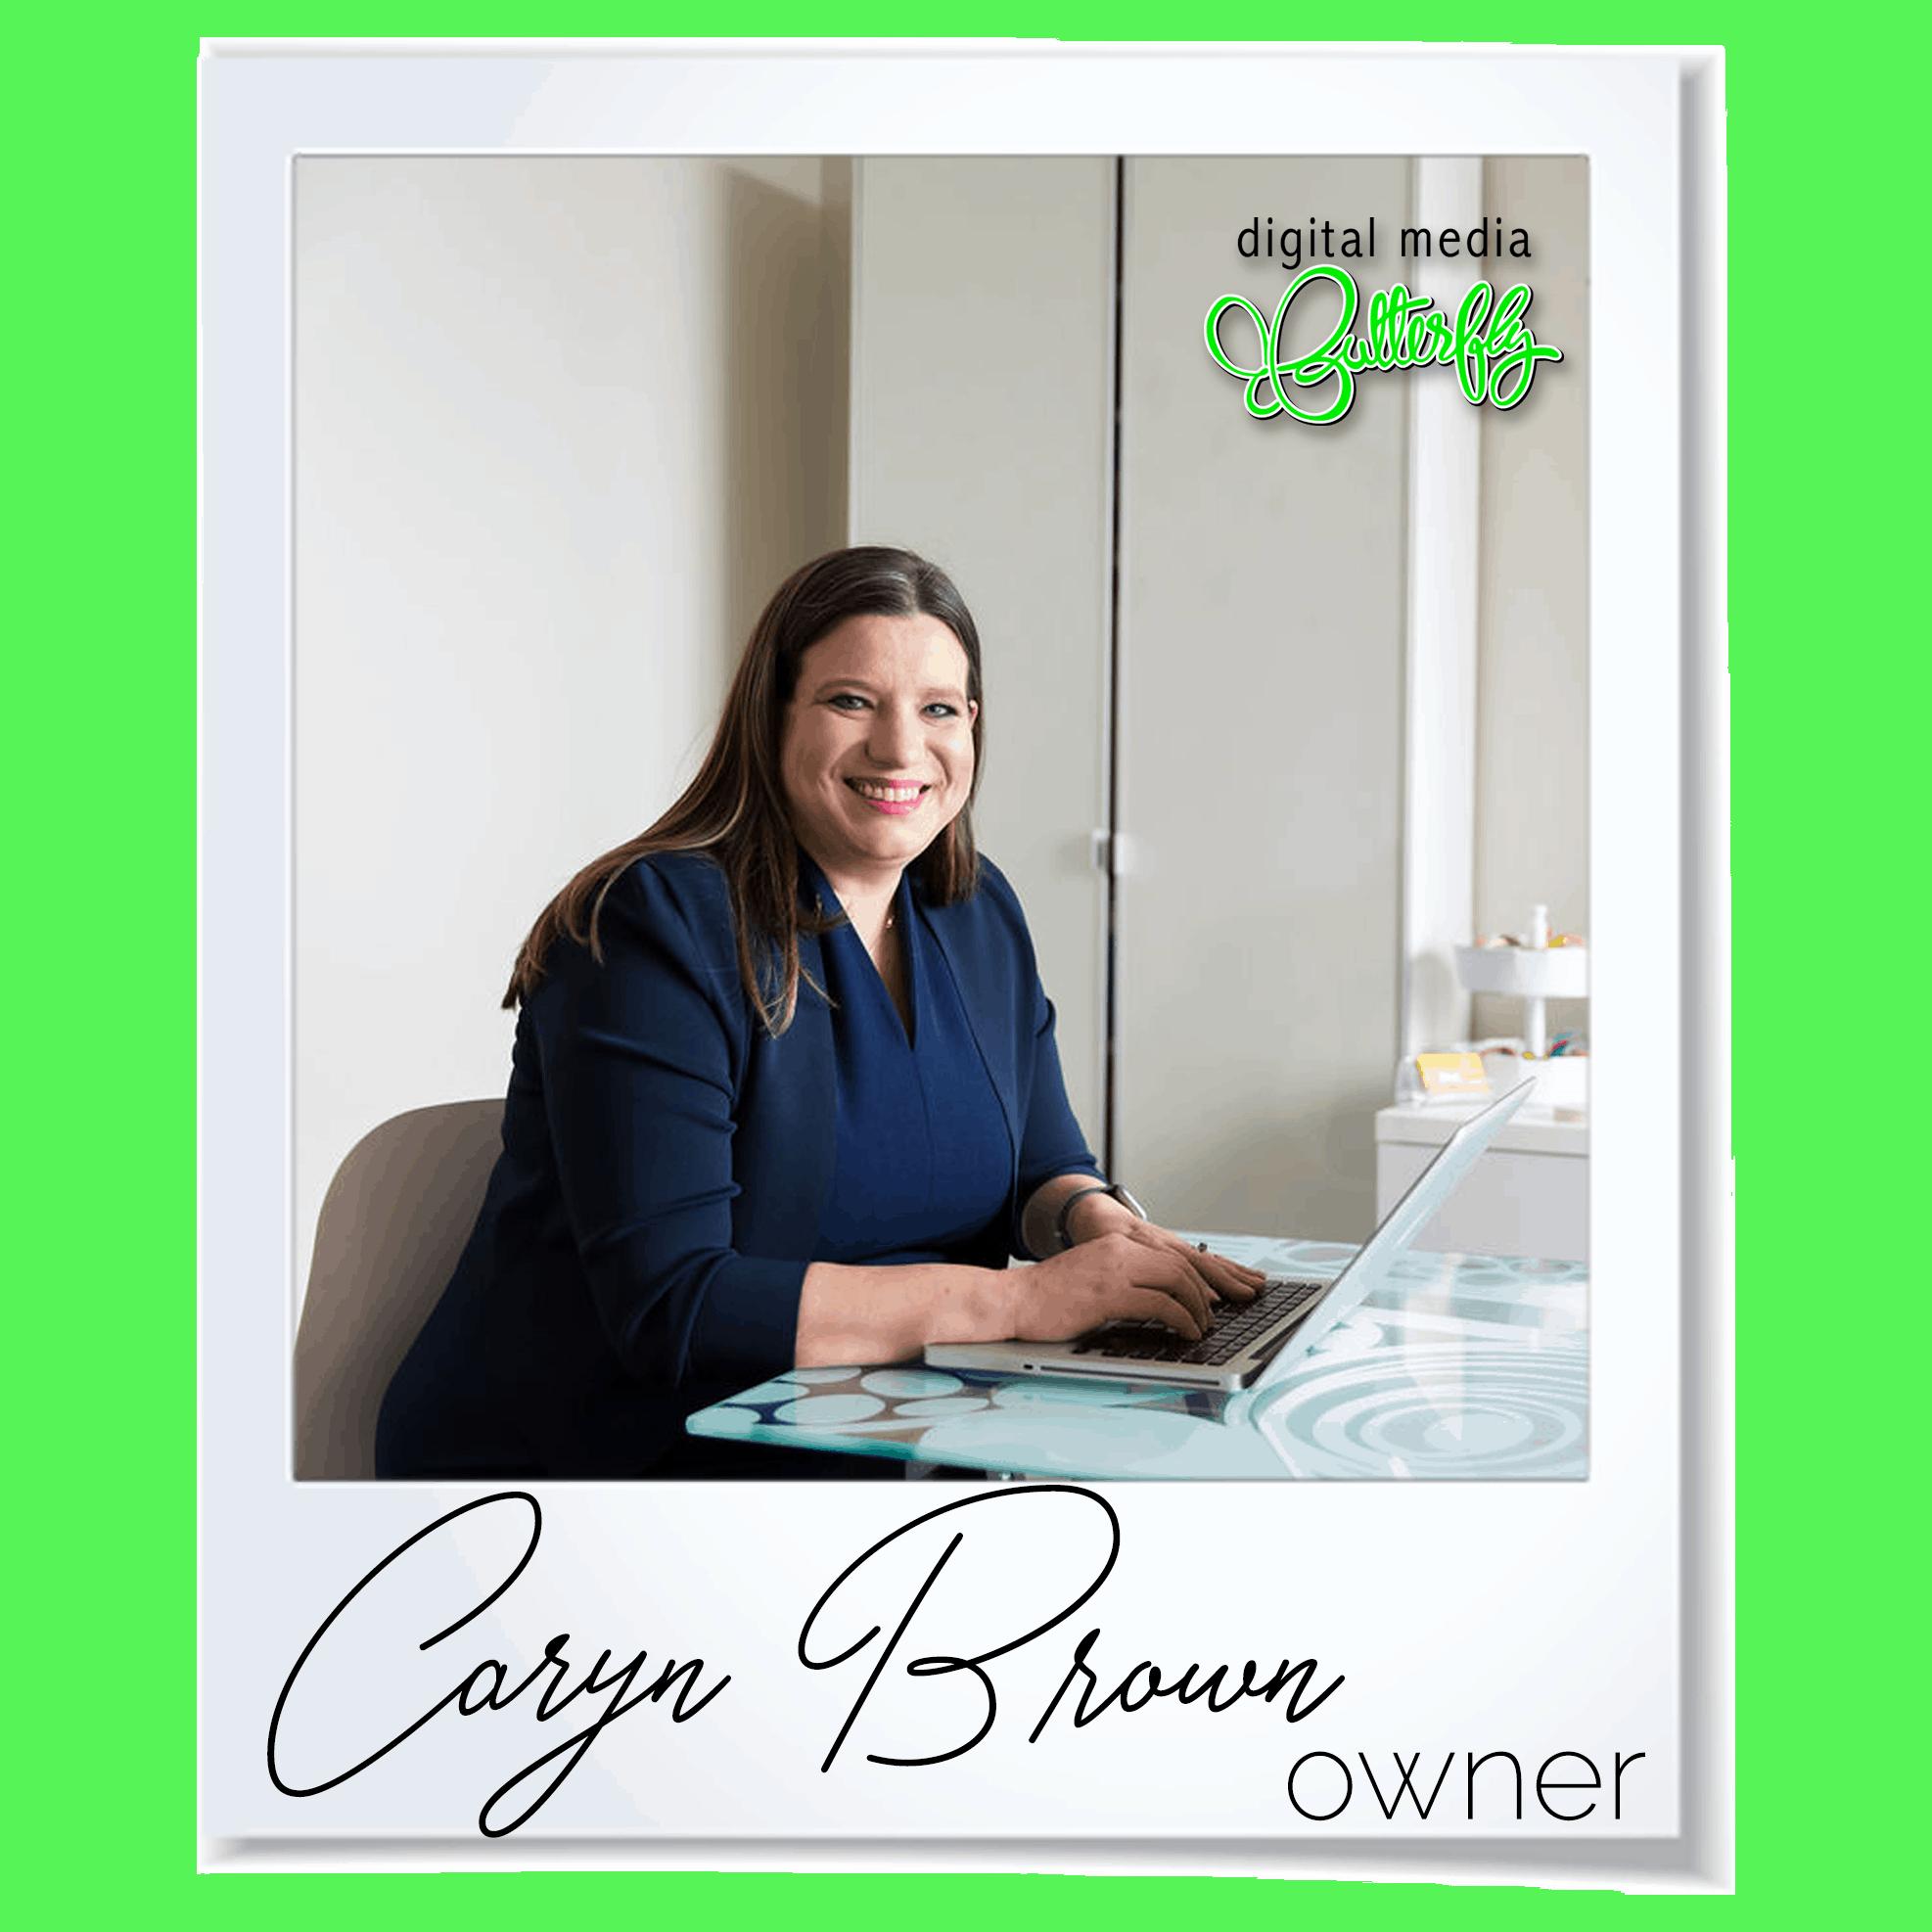 Caryn-Brown-Marketing-Agency-Owner